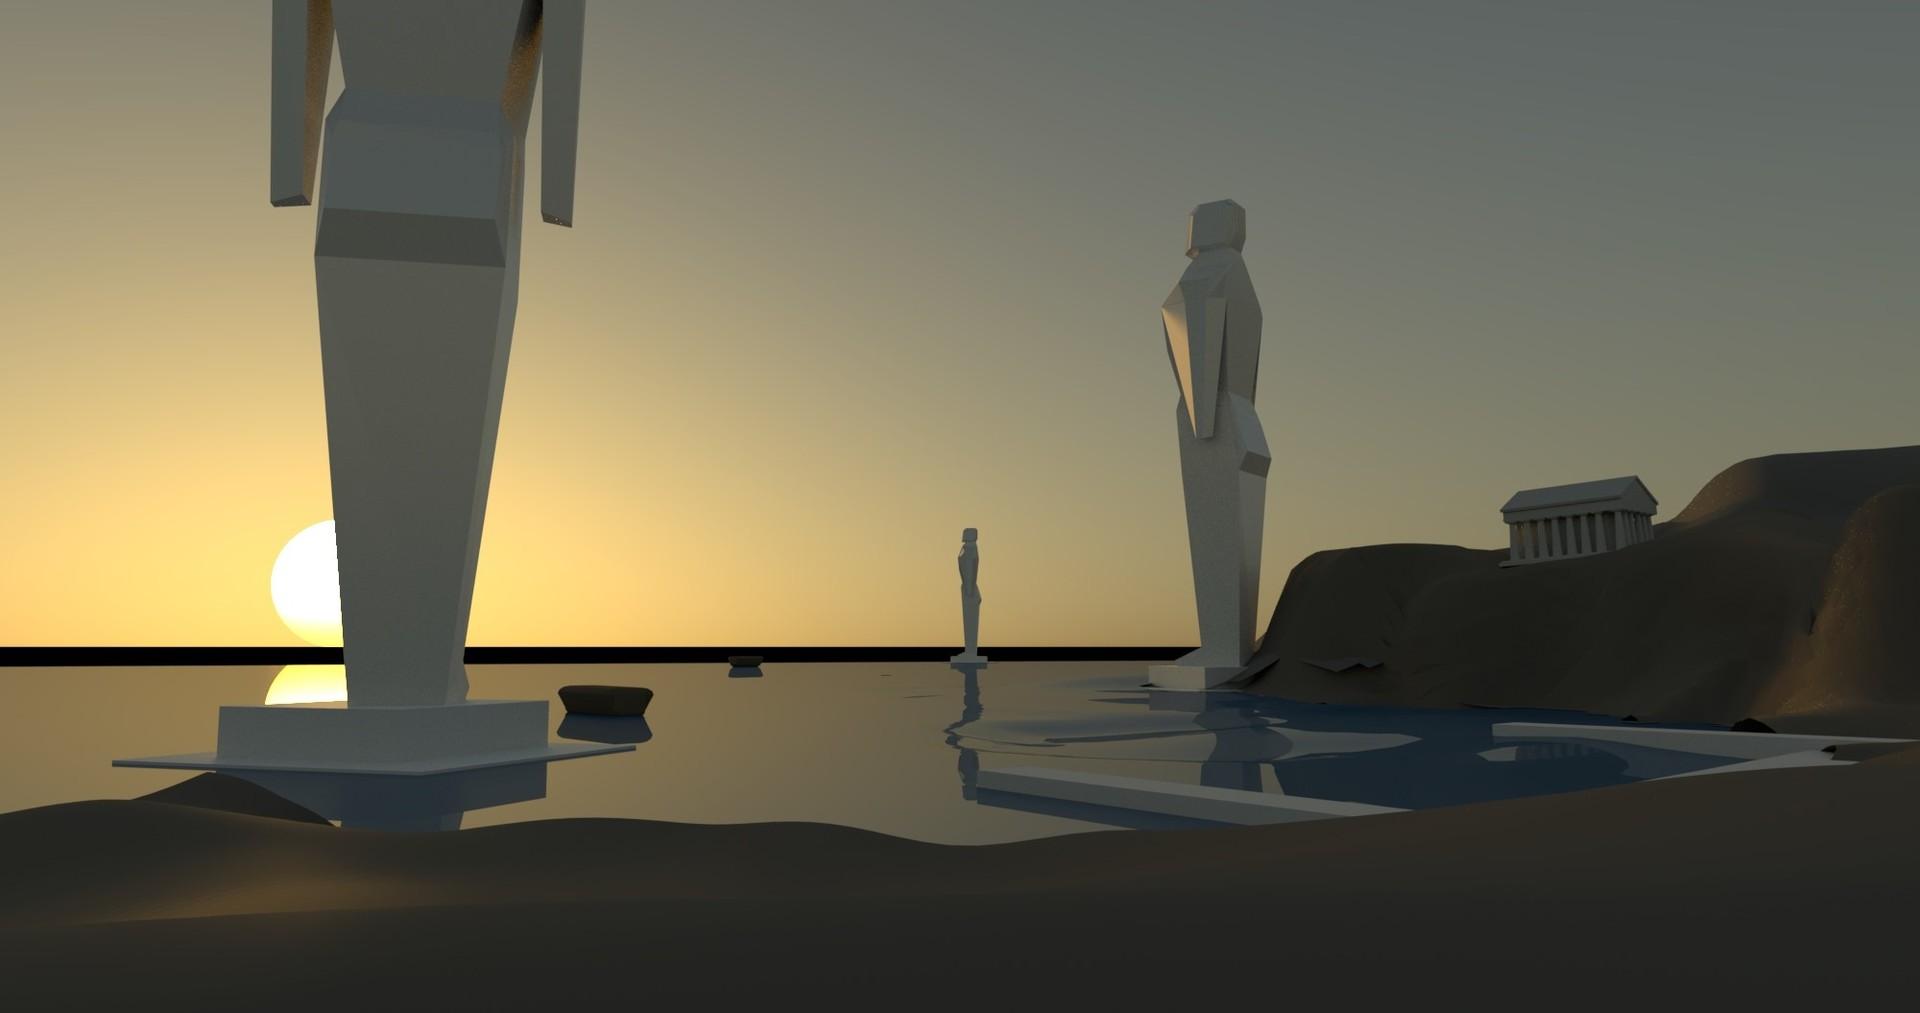 3D blockout in Maya